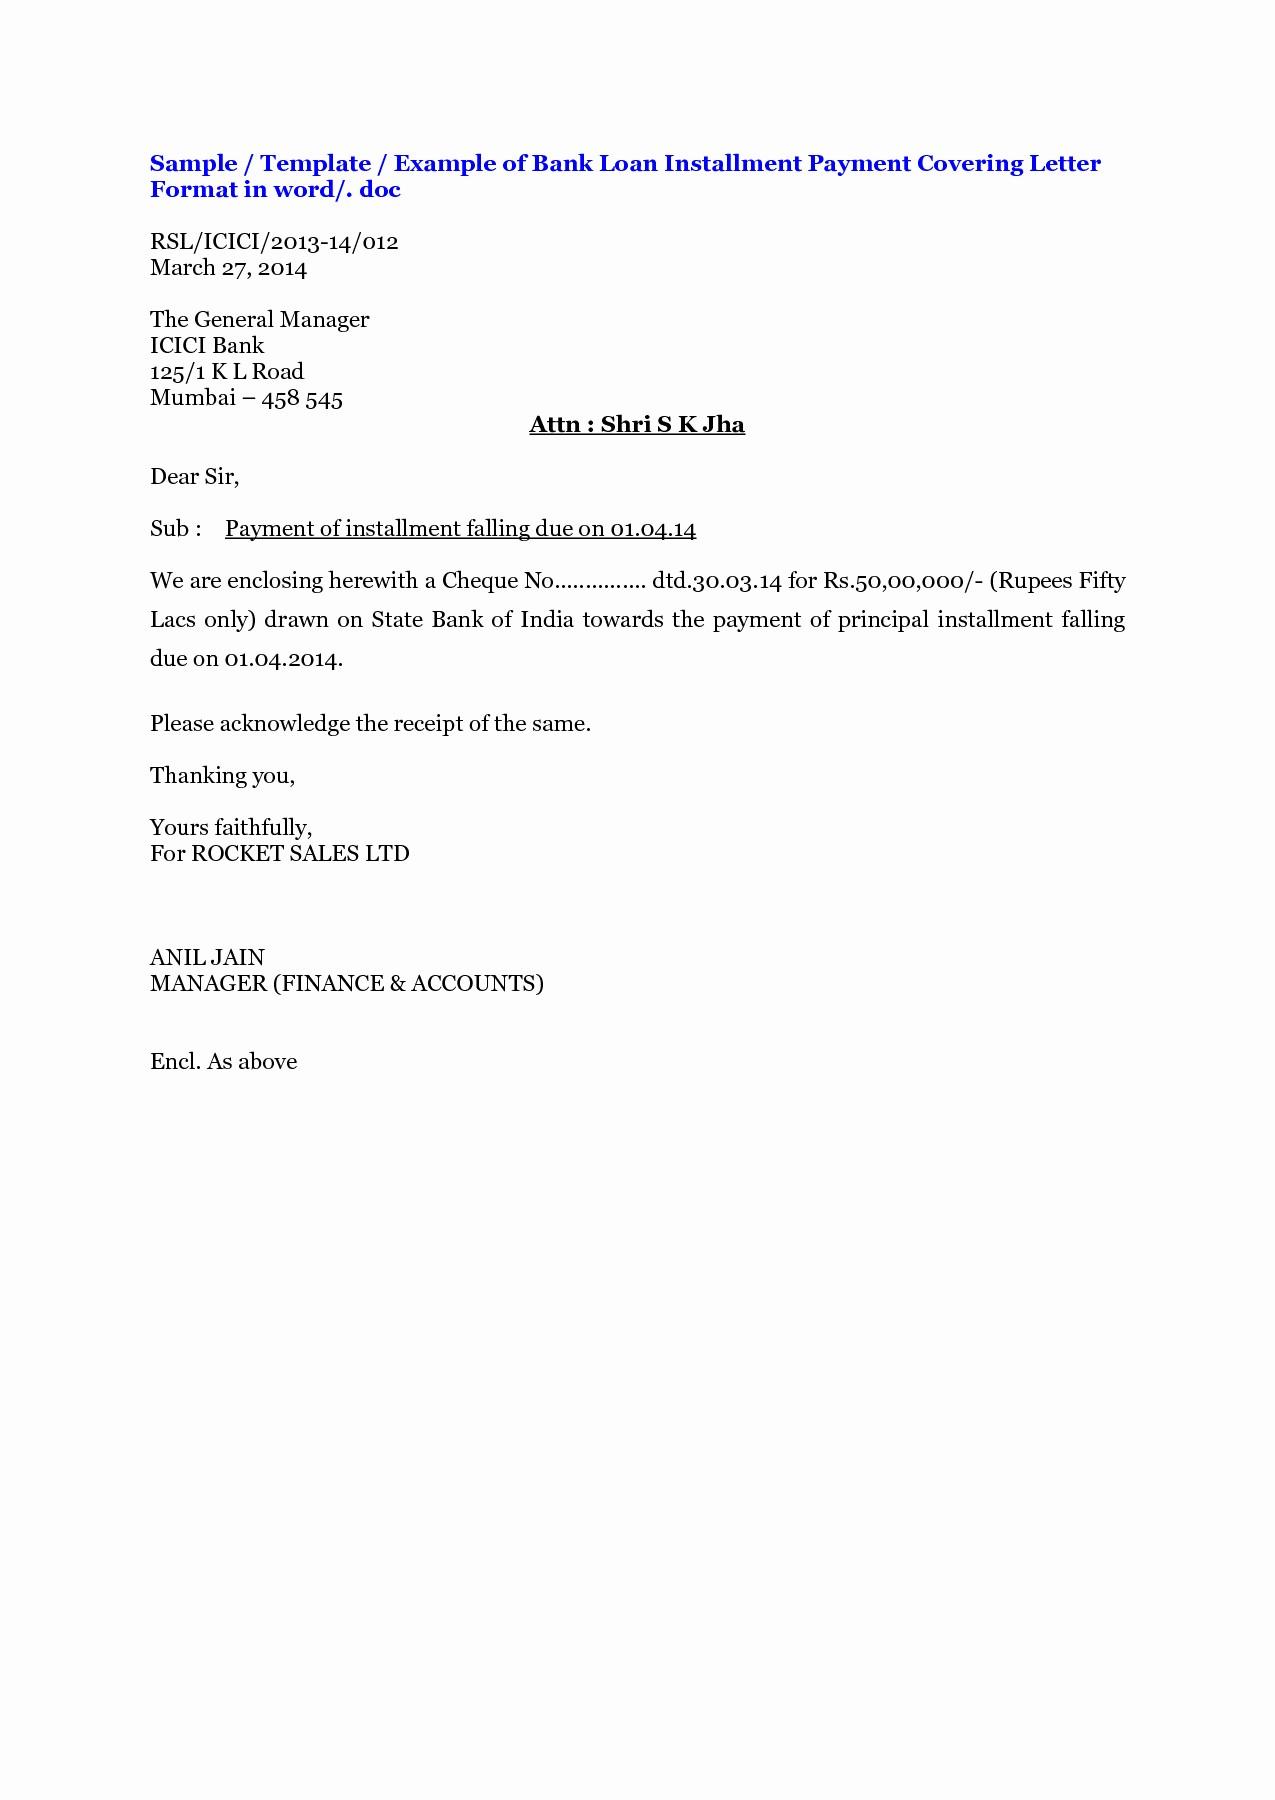 Loan Repayment Letter Template - Bank Loan Repayment Letter format